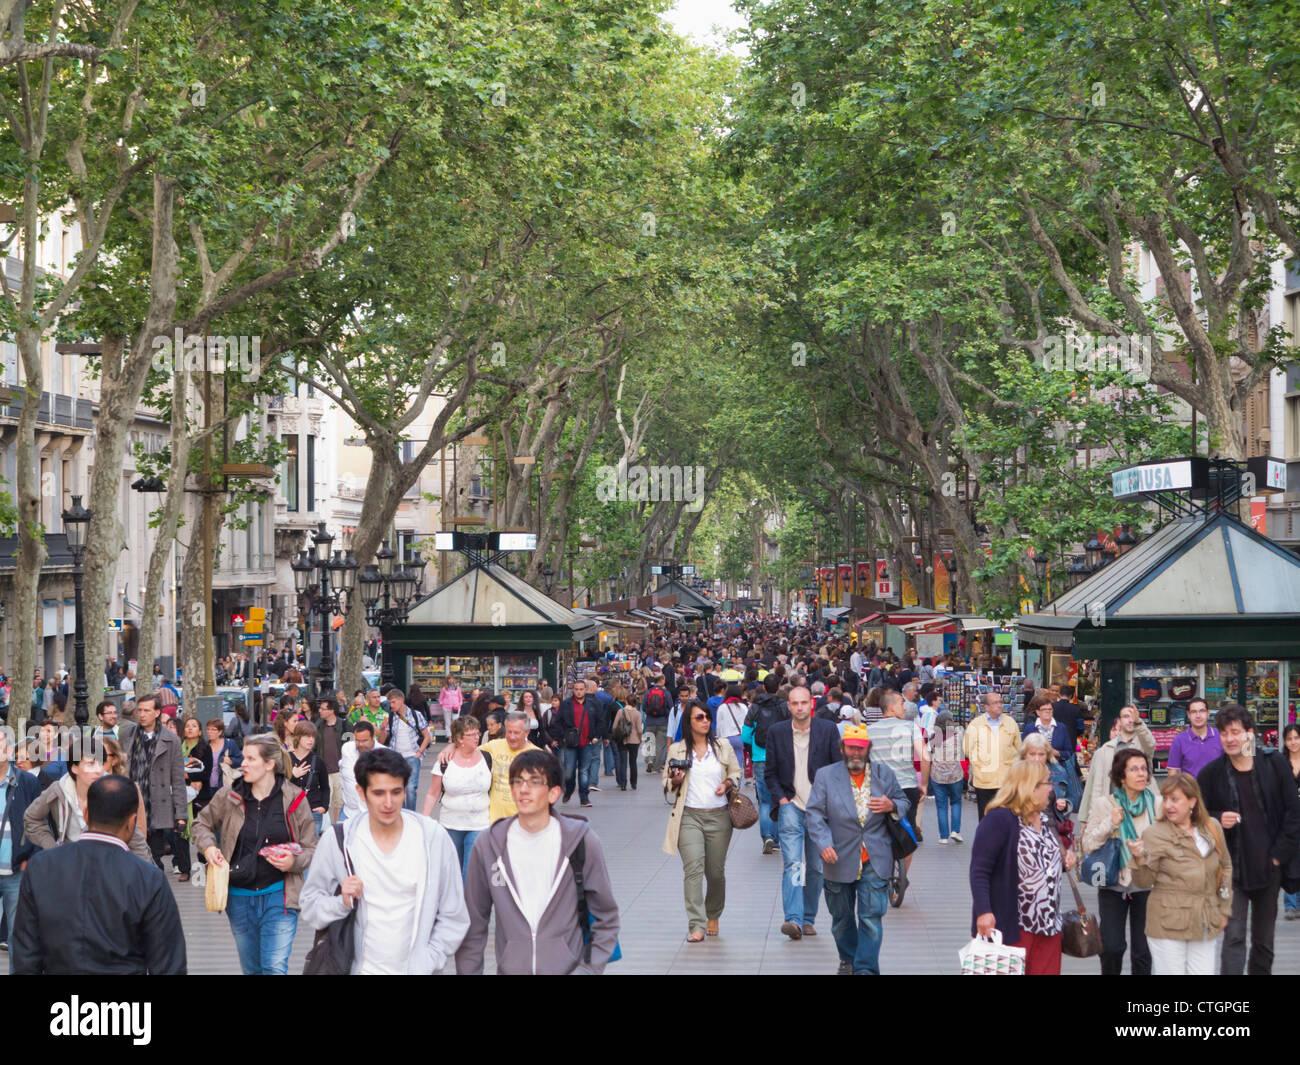 Barcelona, Spain. Crowds strolling in La Rambla late afternoon. - Stock Image